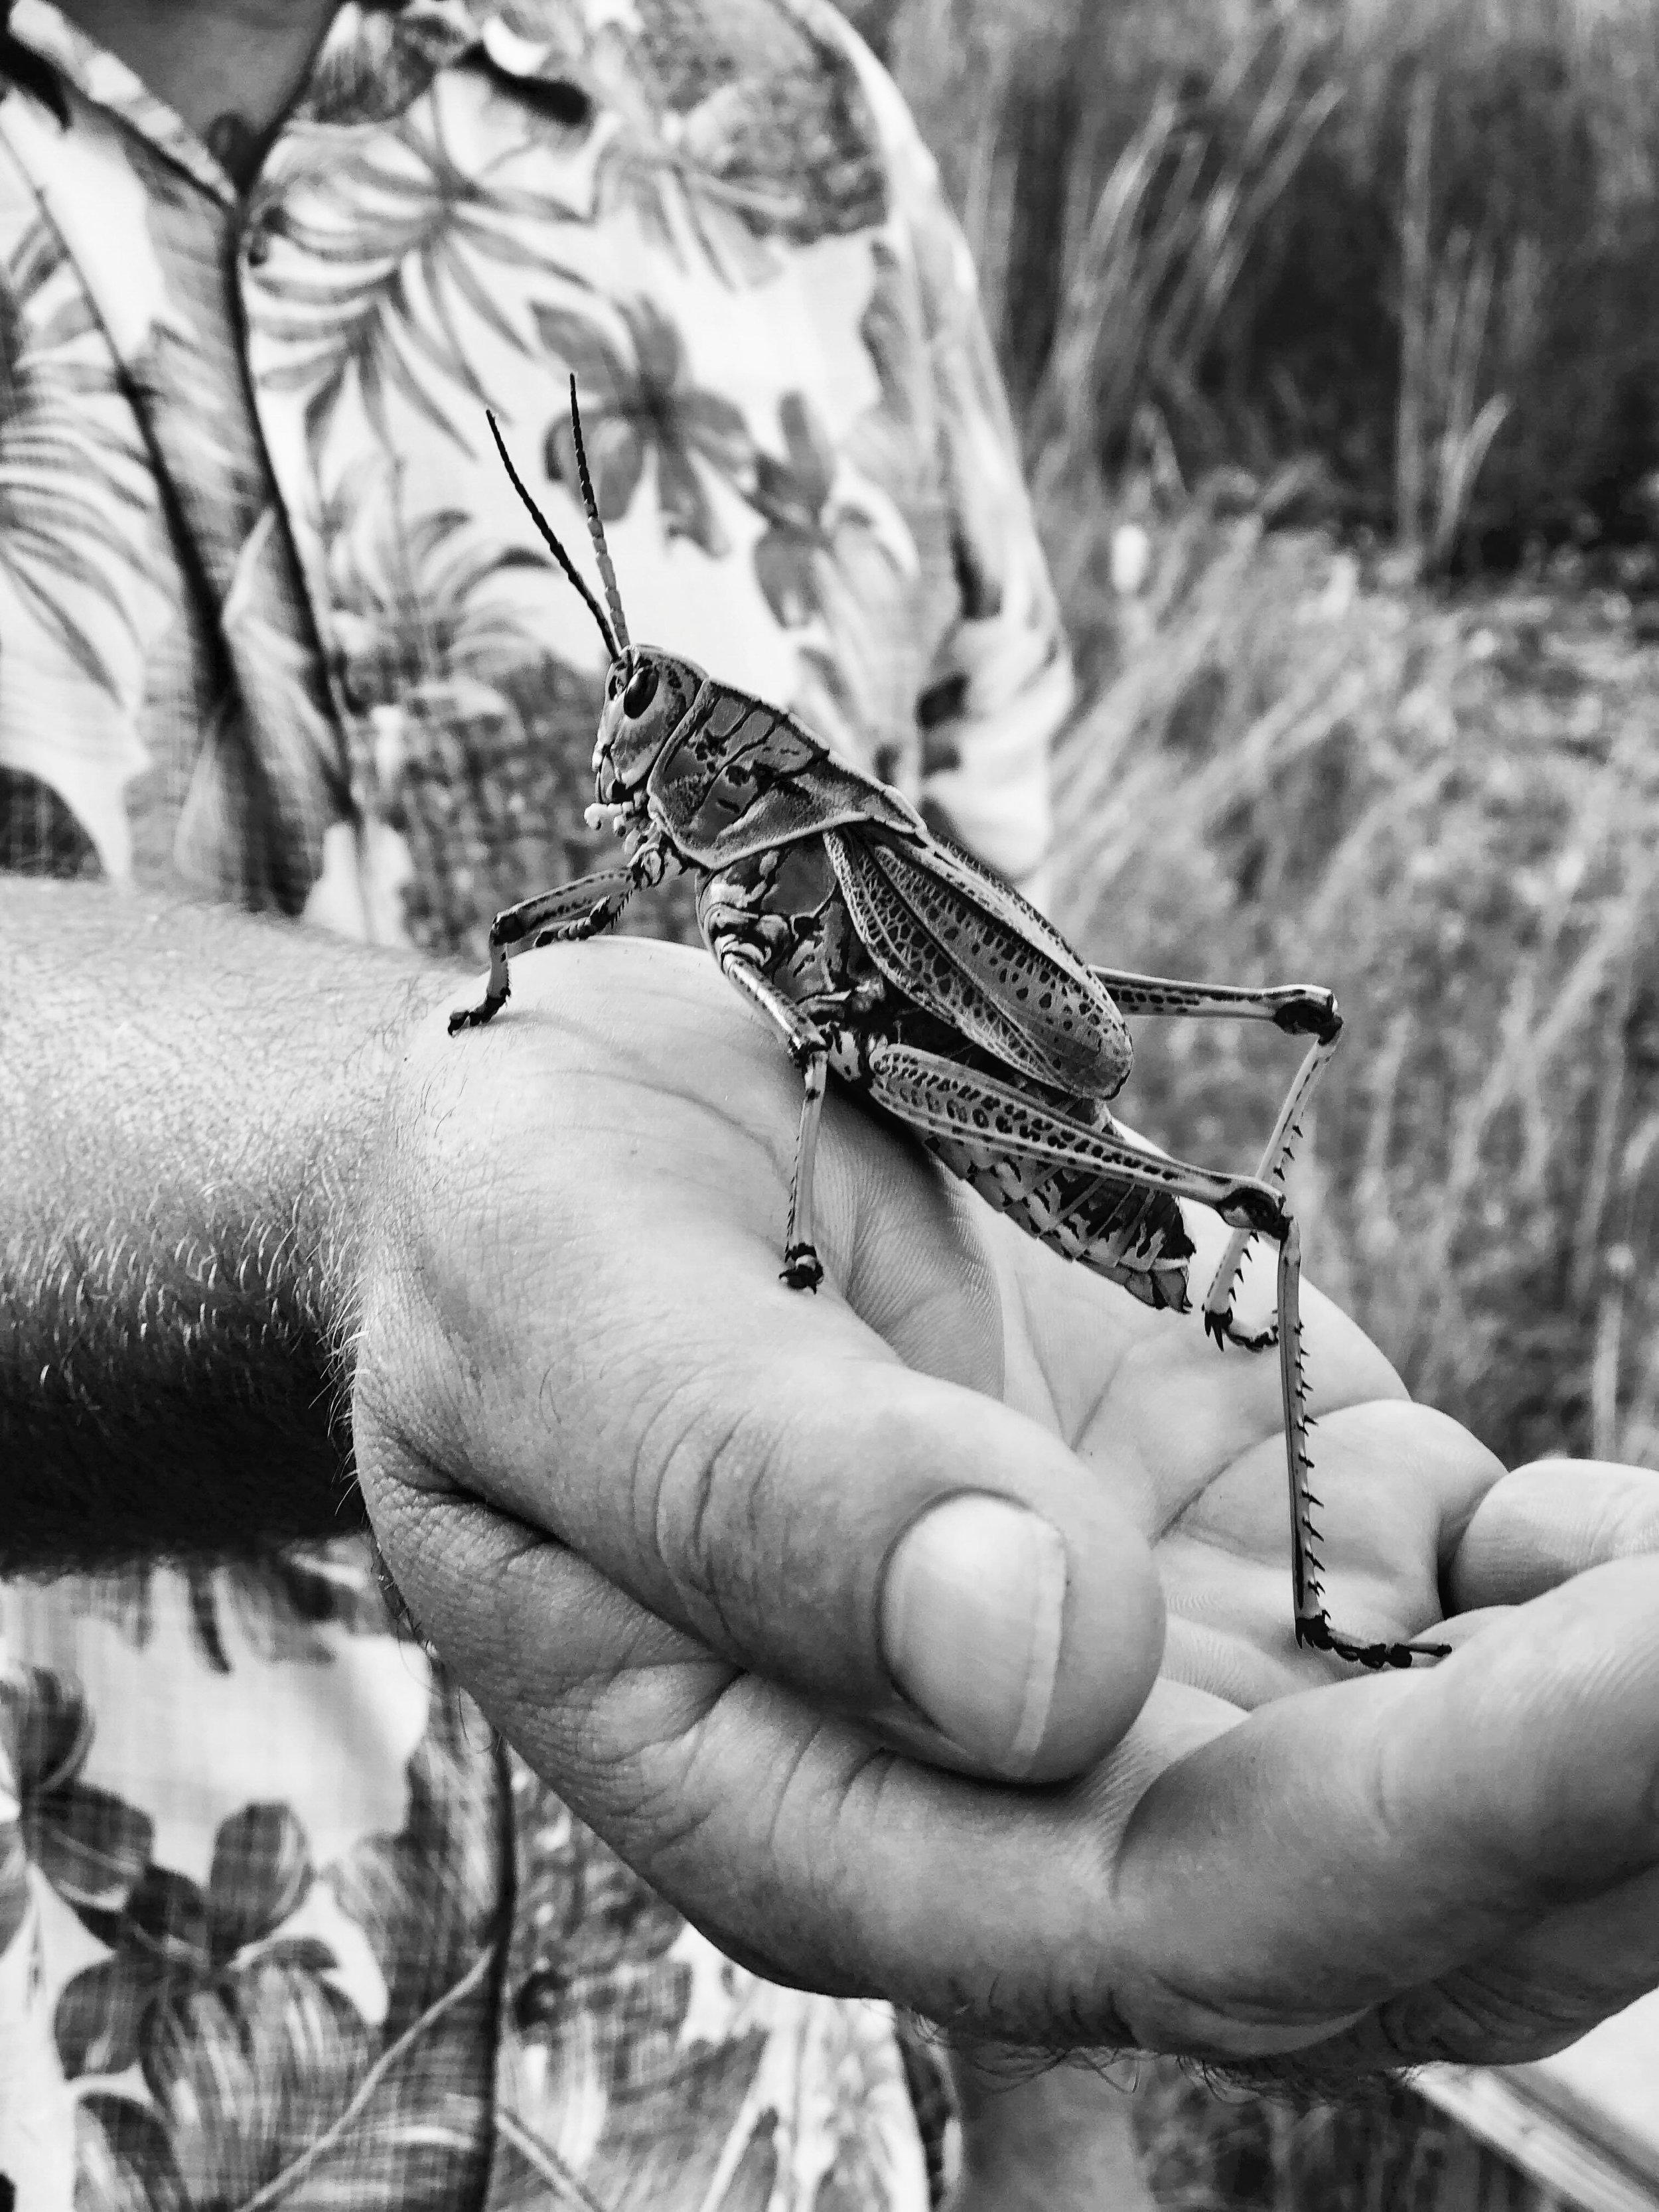 Grasshopper, Everglades